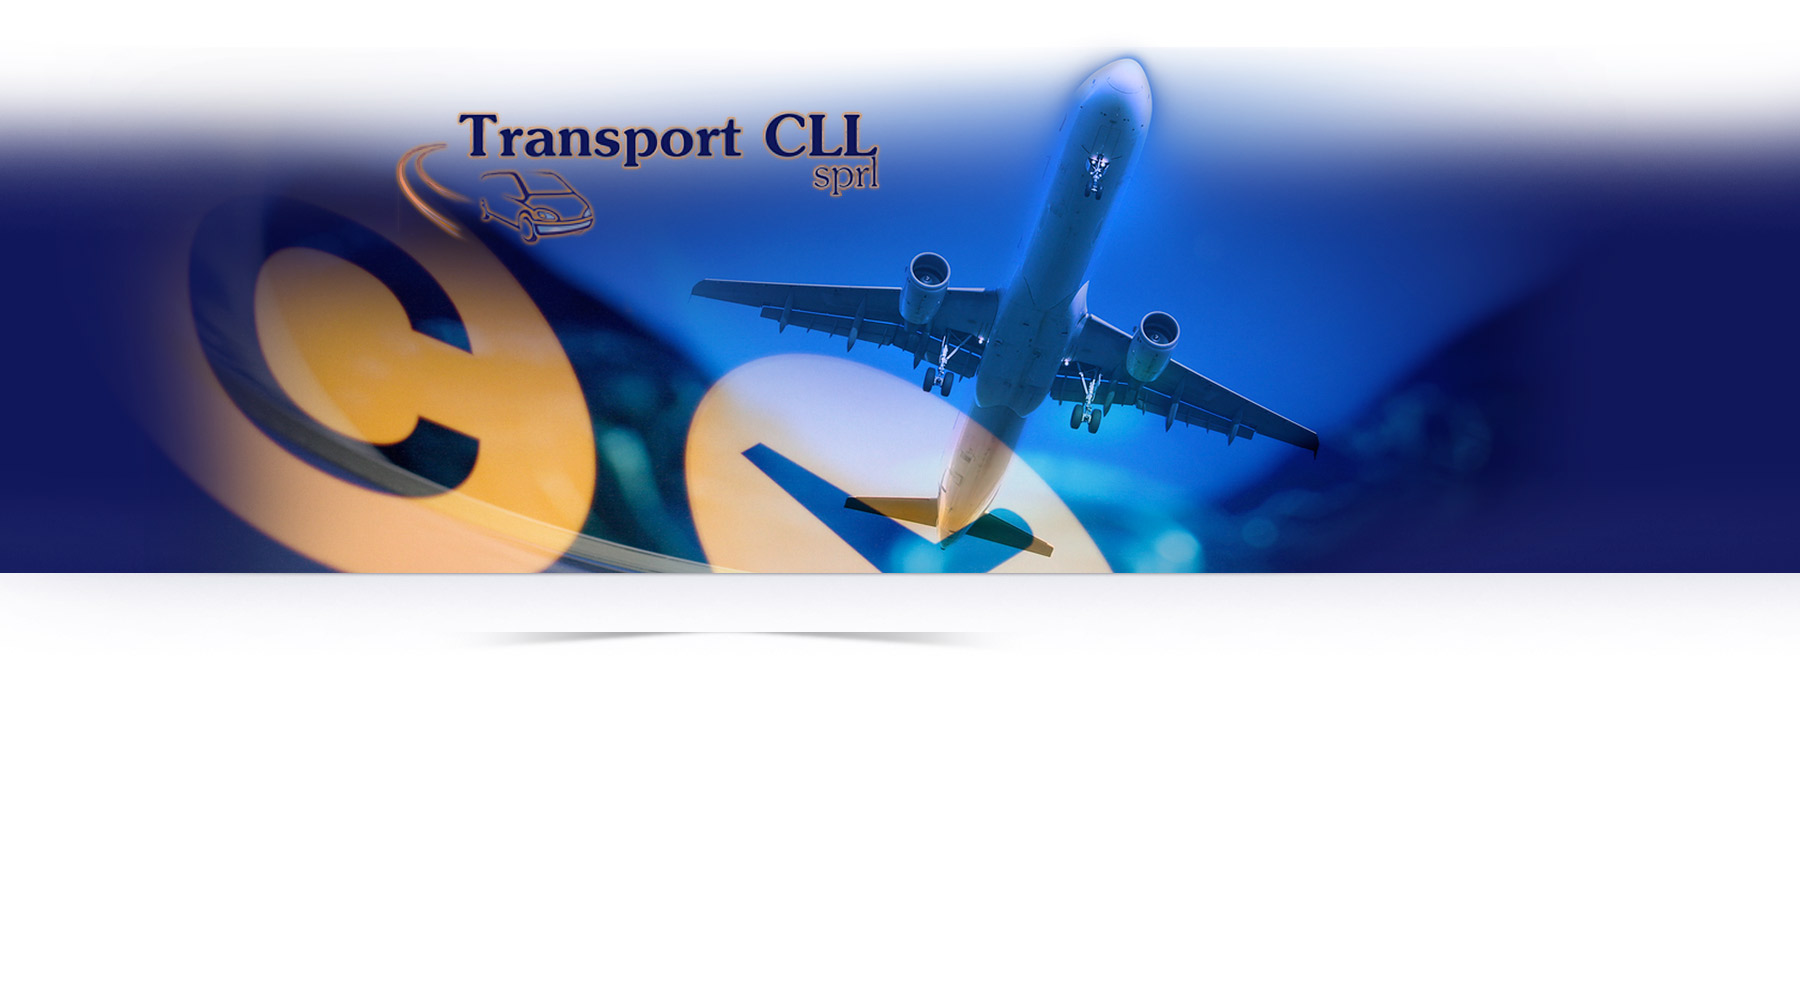 Navette aéroport - Transport CLL - 1